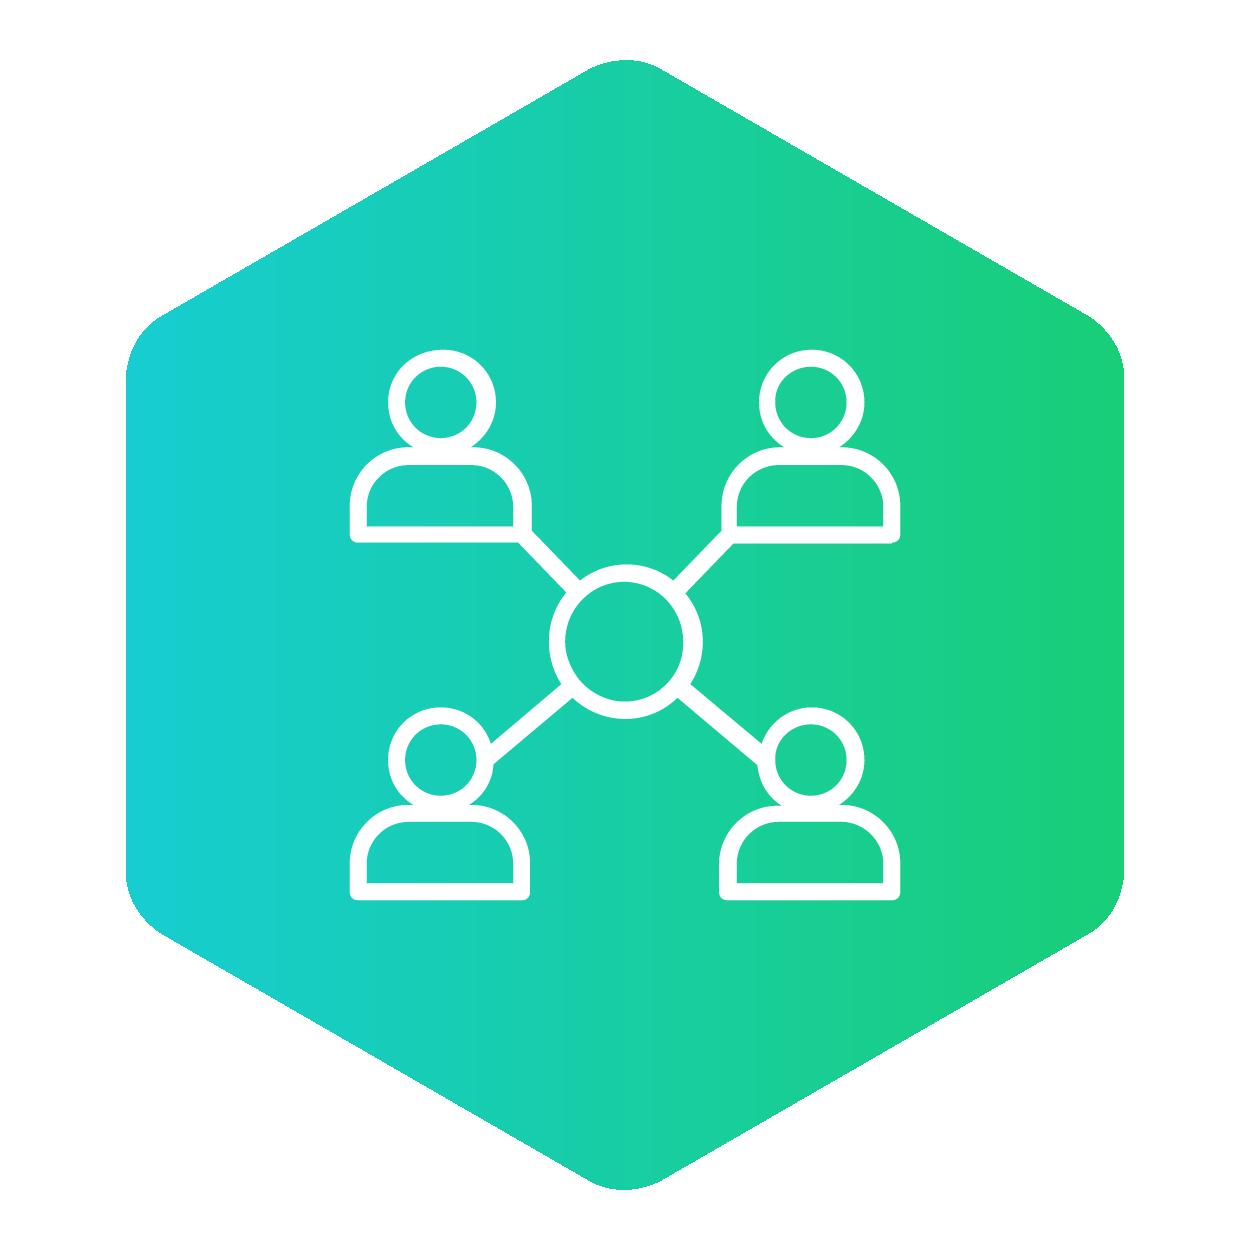 hexagon_teaming.png